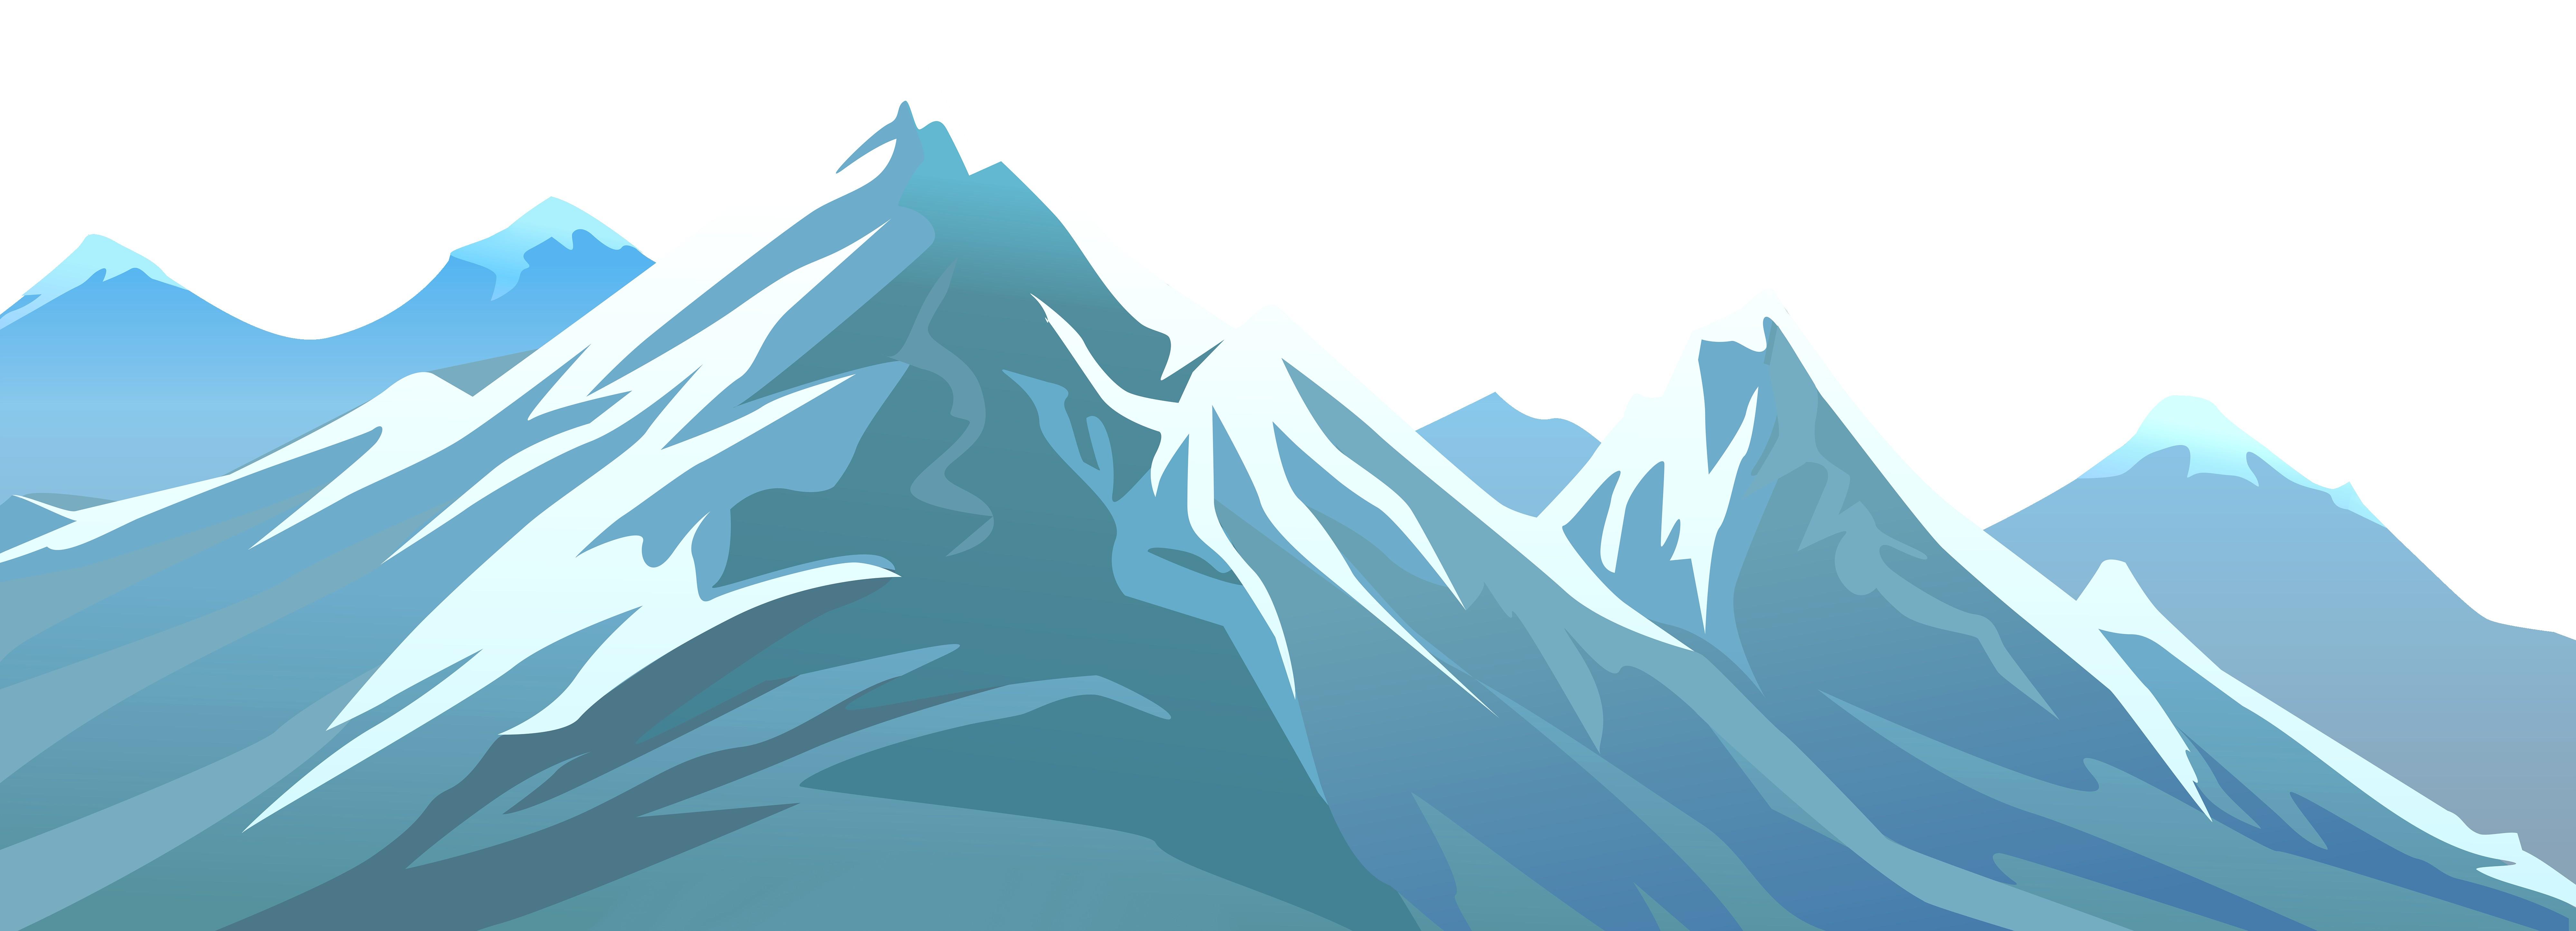 Free ground download clip. Lake clipart terrain